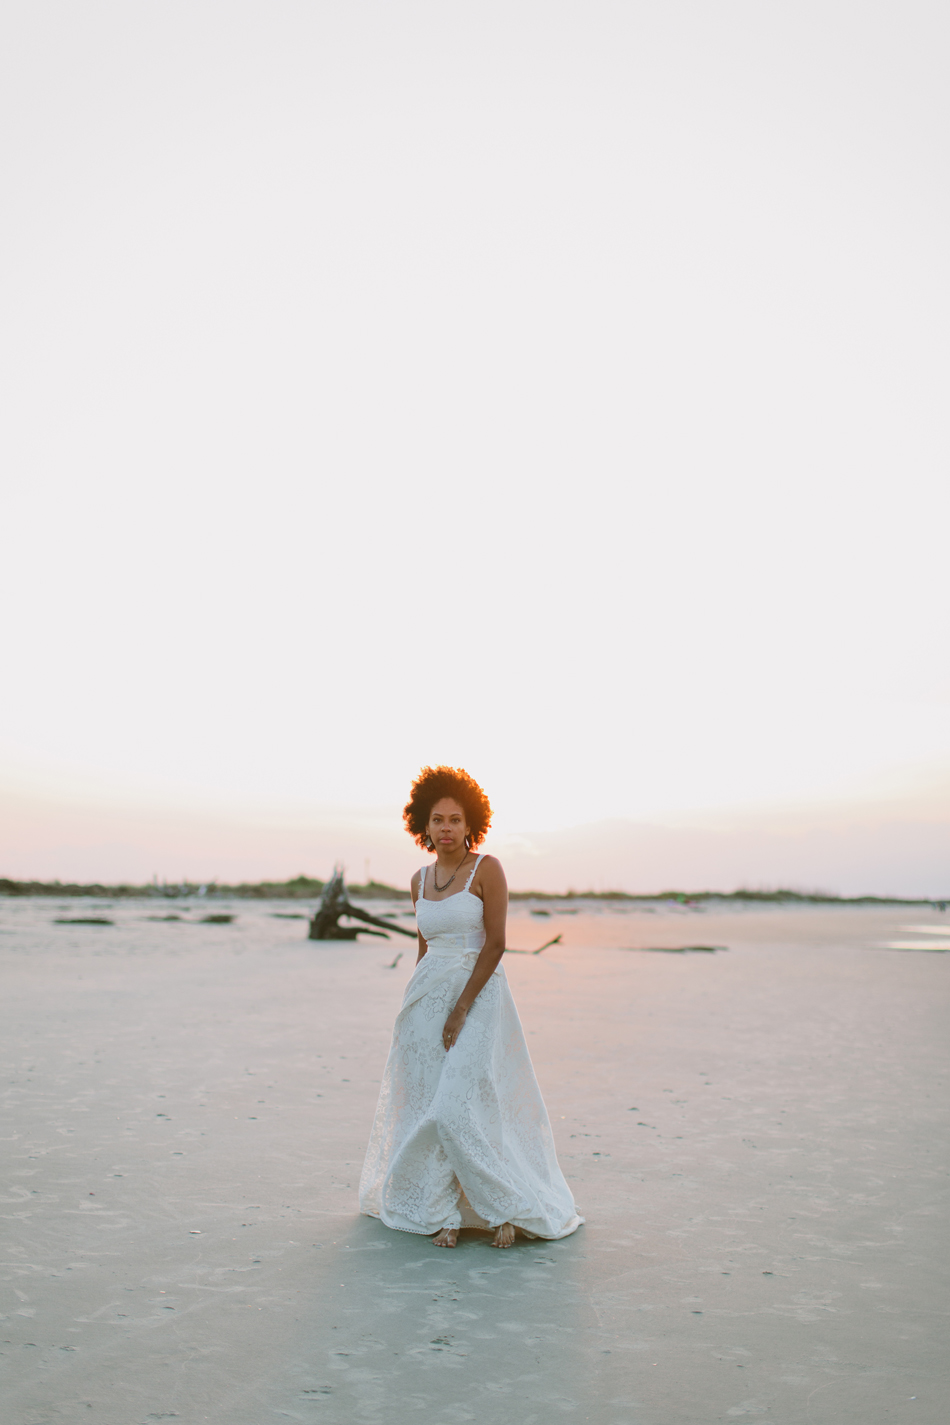 Jameykay_arlie_bohemian_elopement_styled_shoot081.jpg